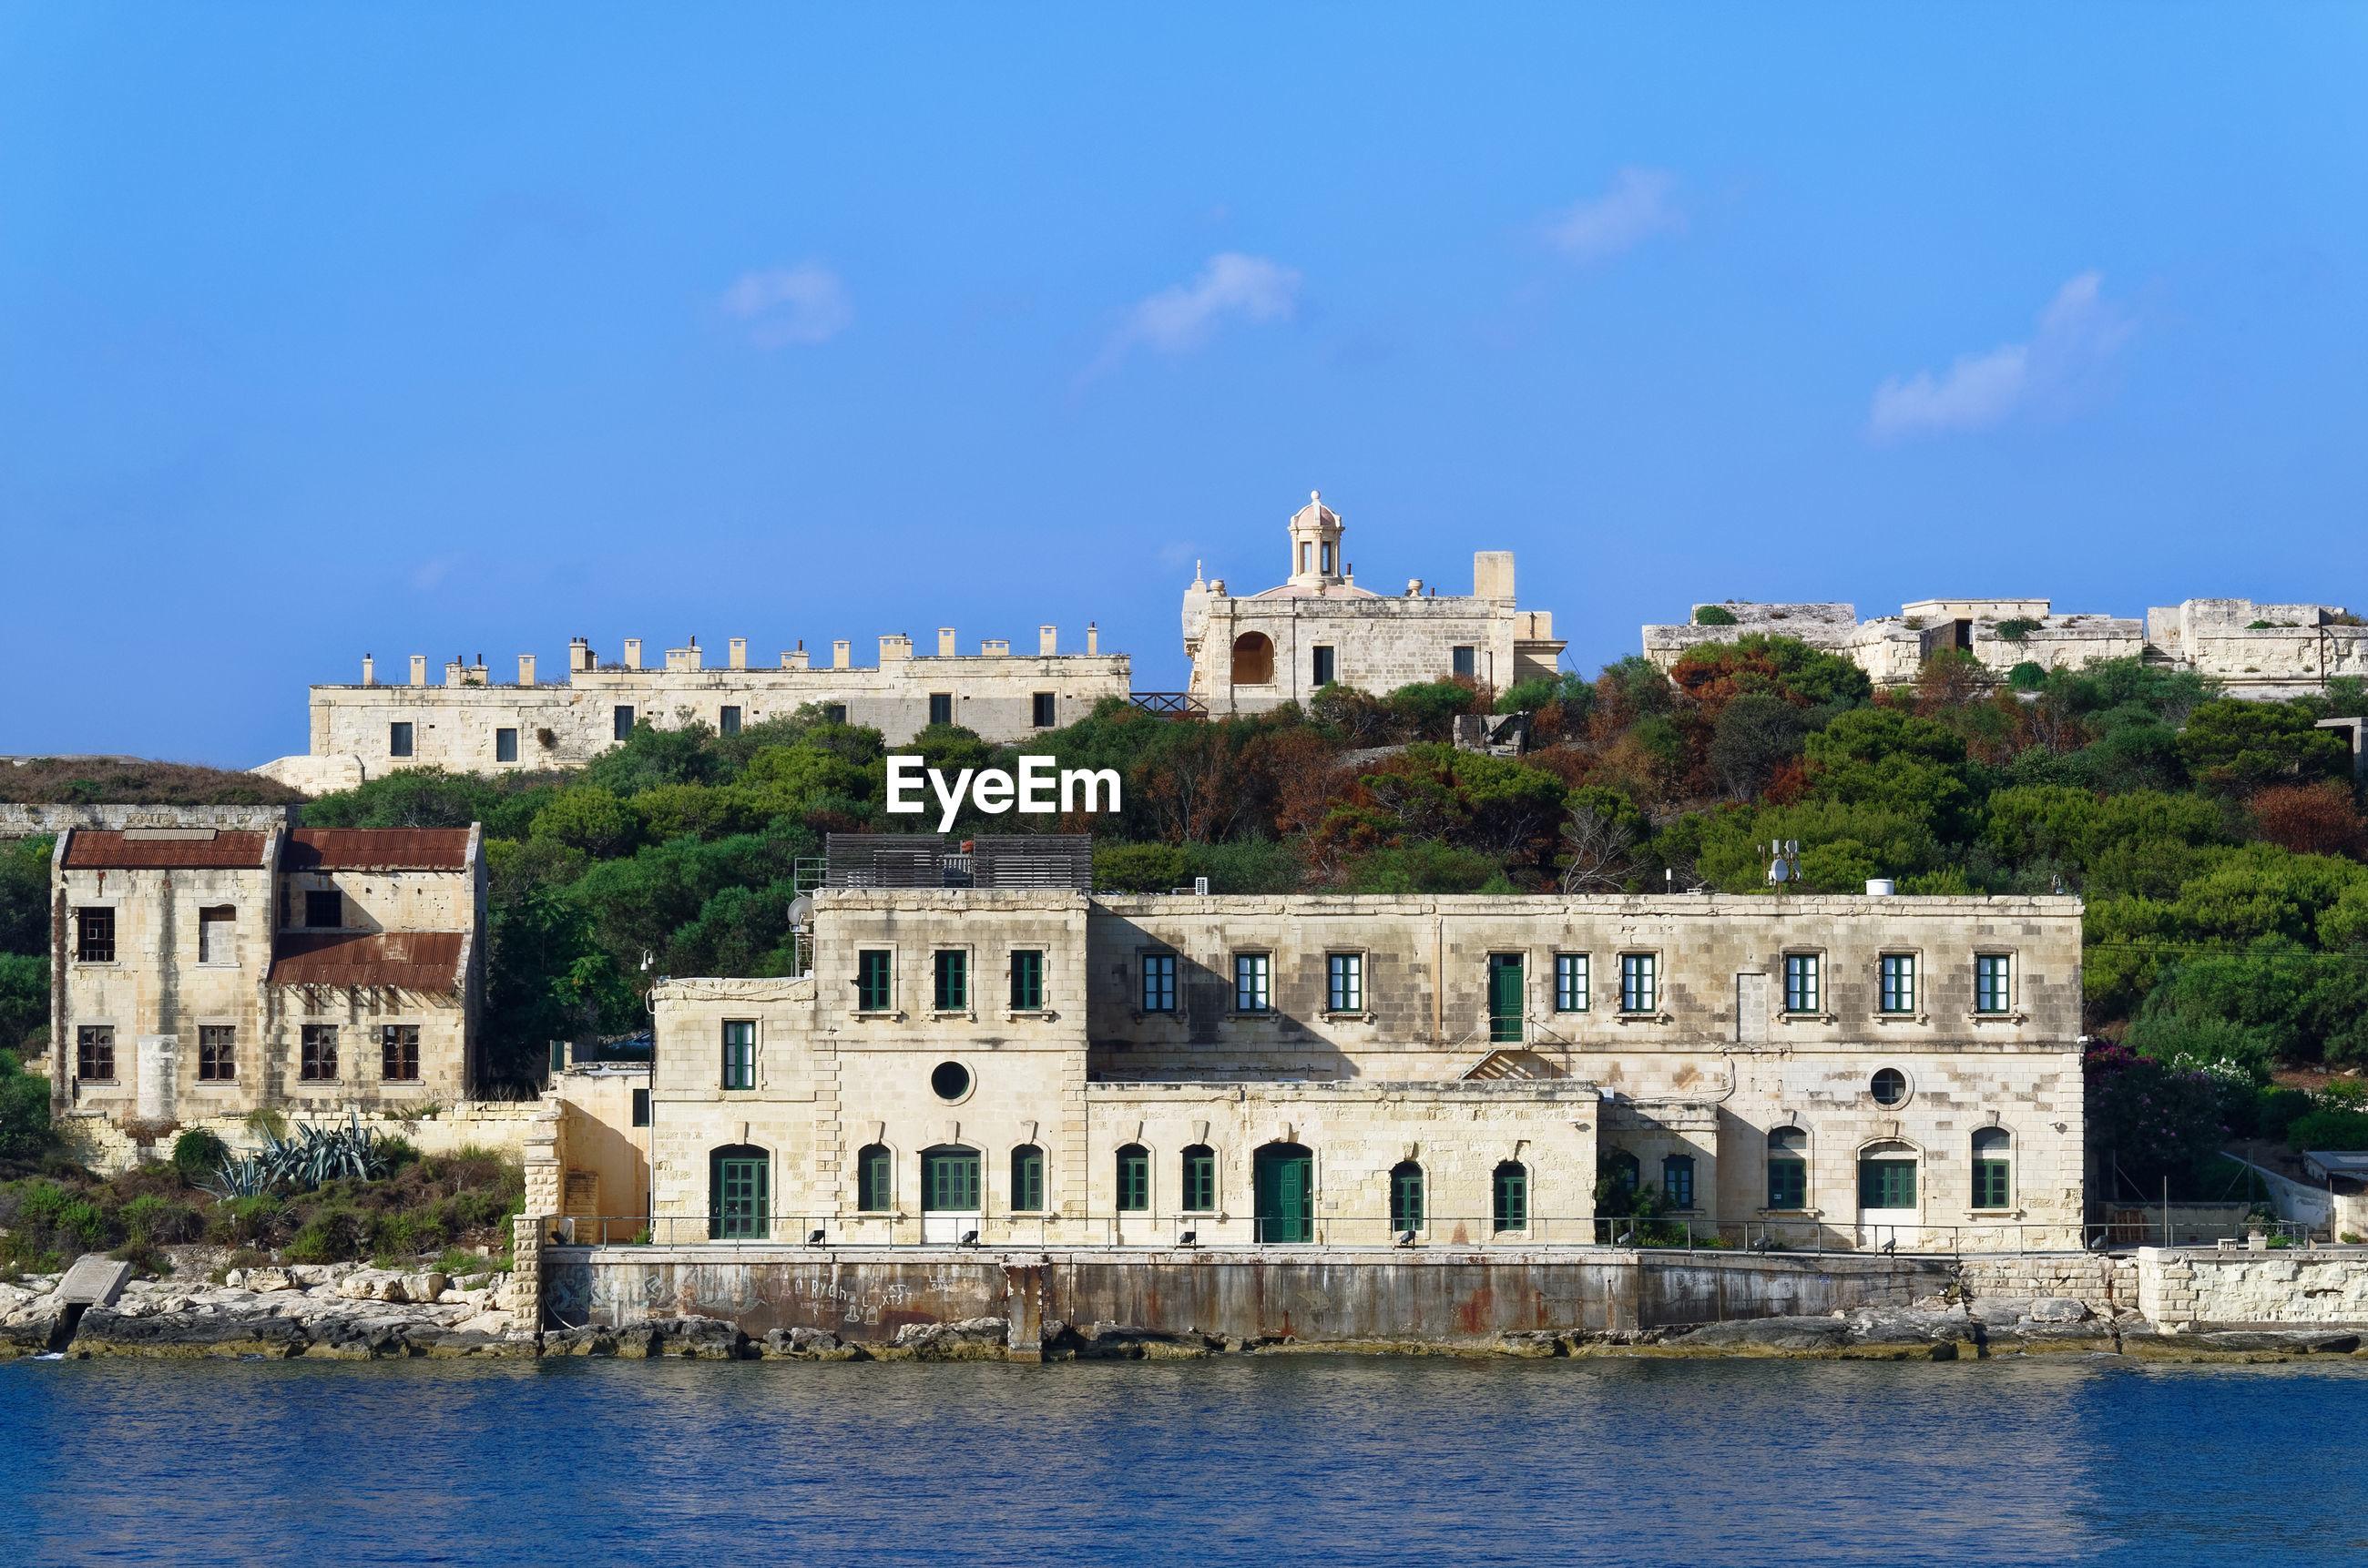 Former hospital building on the manoel island in malta